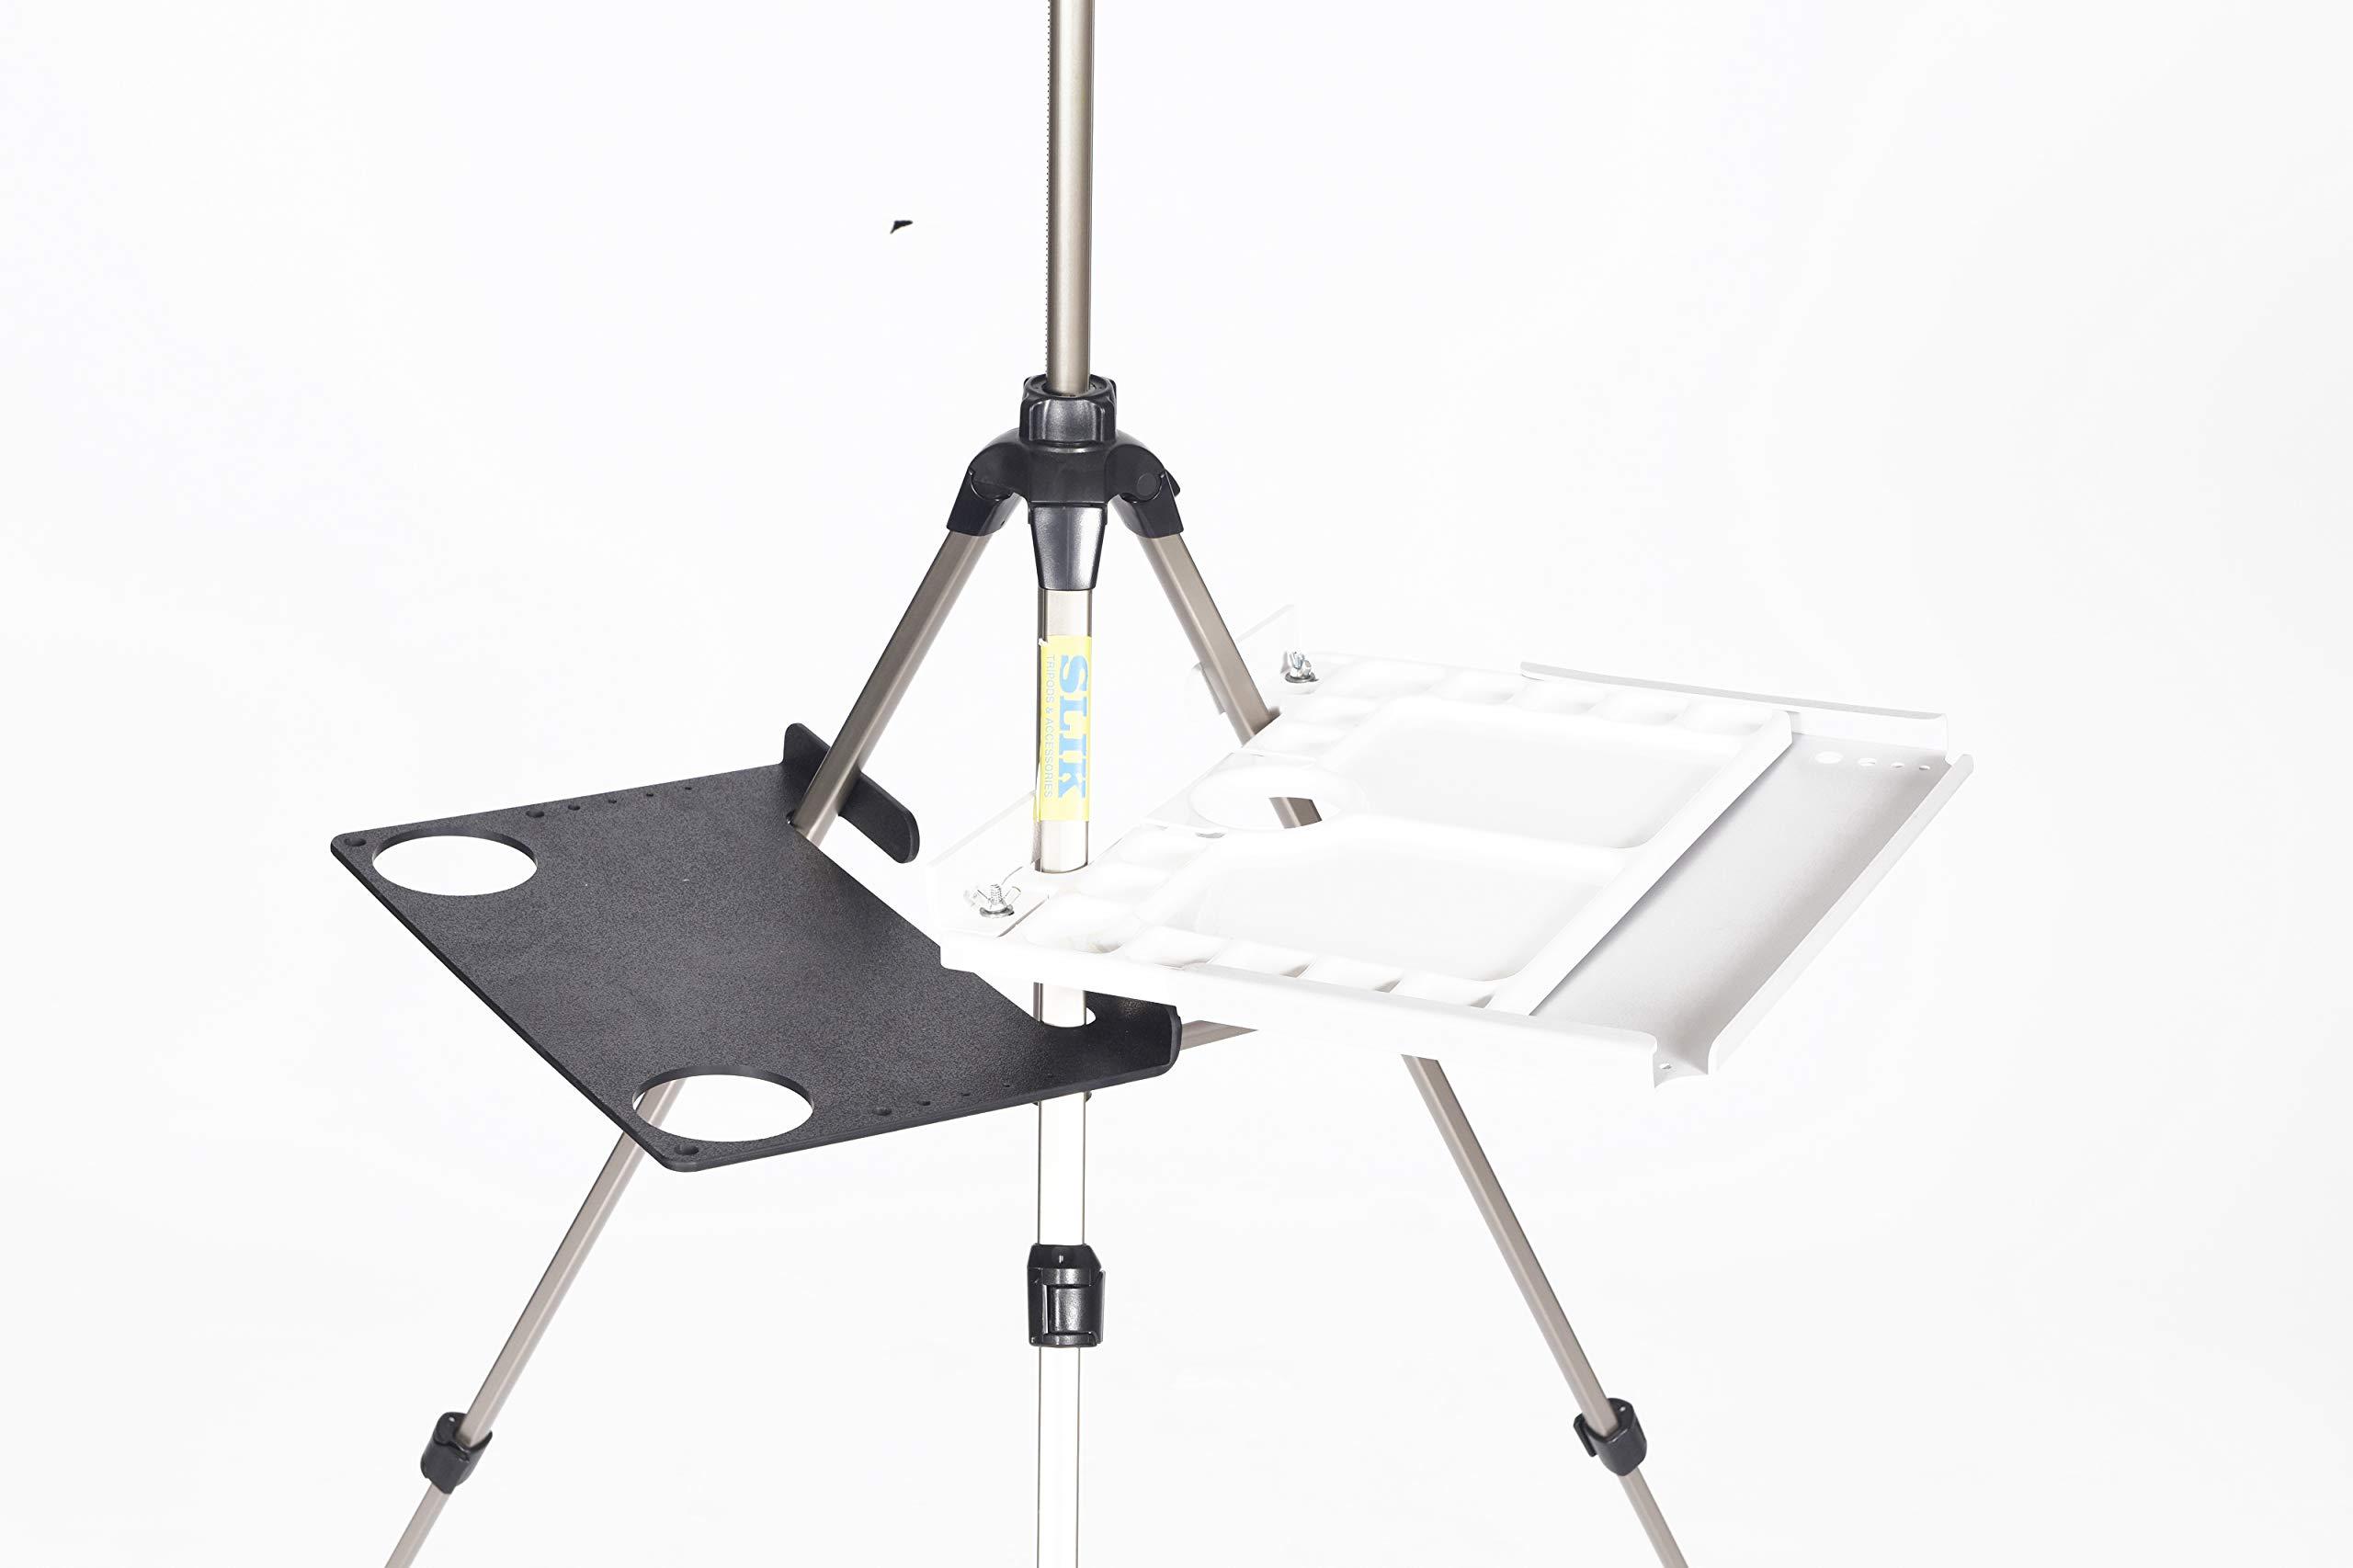 2 Hole Tripod Shelf by En Plein Air Pro by En Plein Air Pro